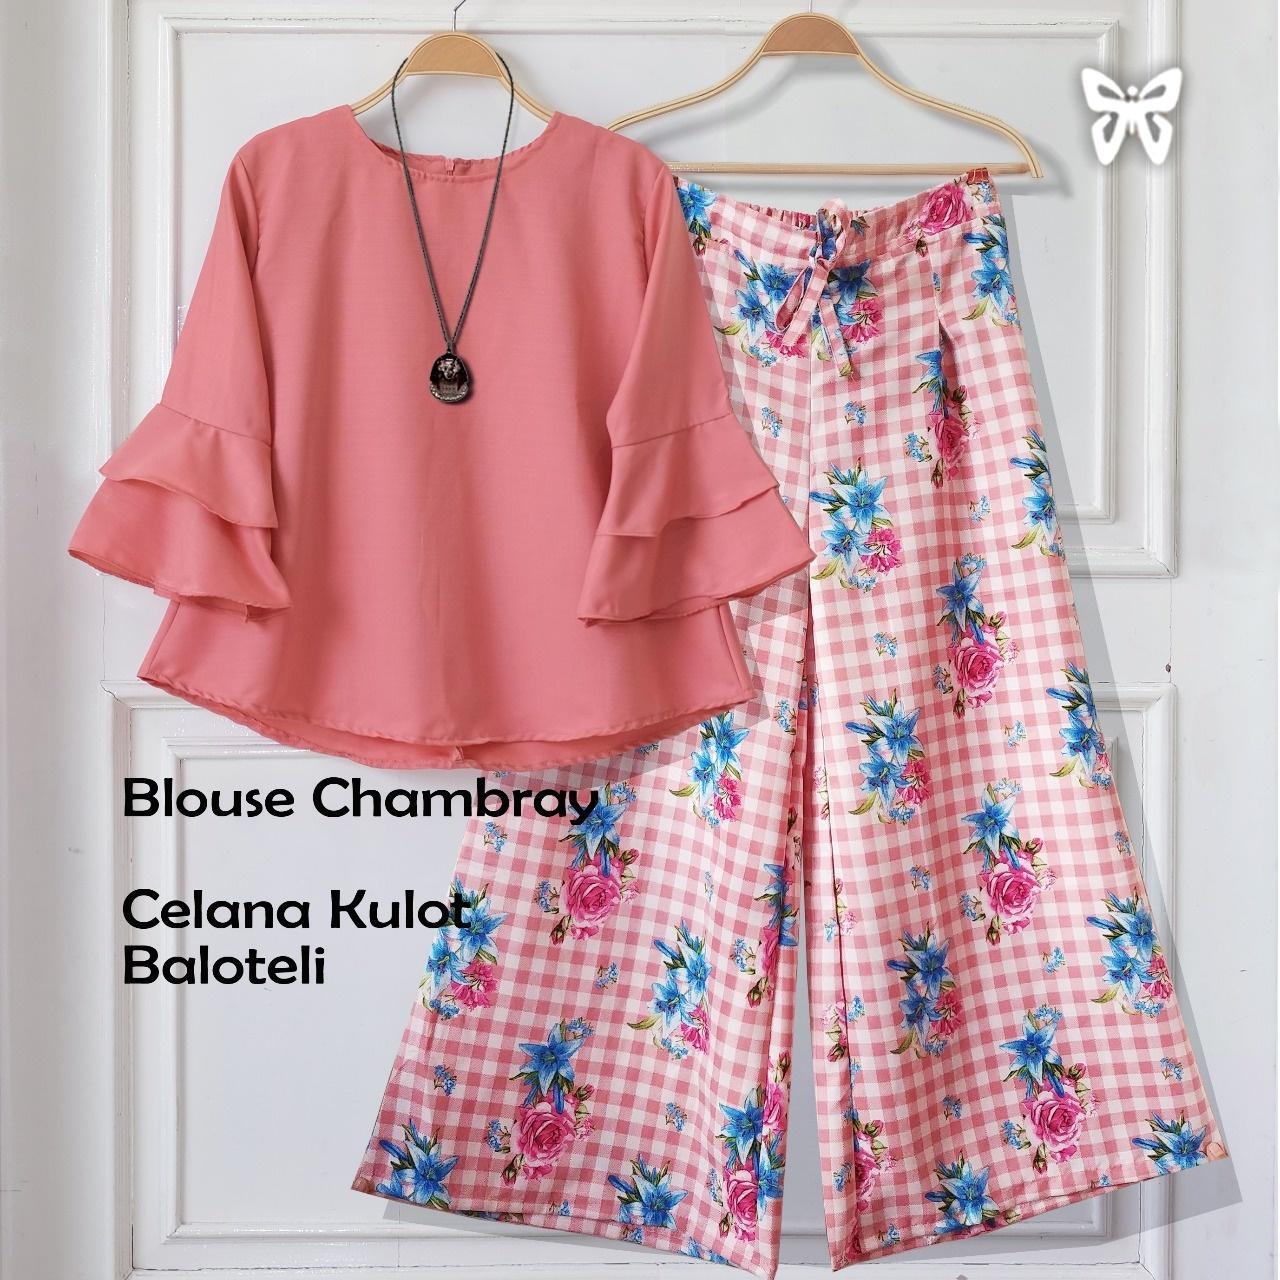 Flavia Store Setelan Wanita Motif Bunga FS0733 - PEACH / Stelan Muslimah / Atasan Baju Blouse Kemeja Lengan Panjang Terompet Bawahan Celana Kulot Muslim / Srchantika